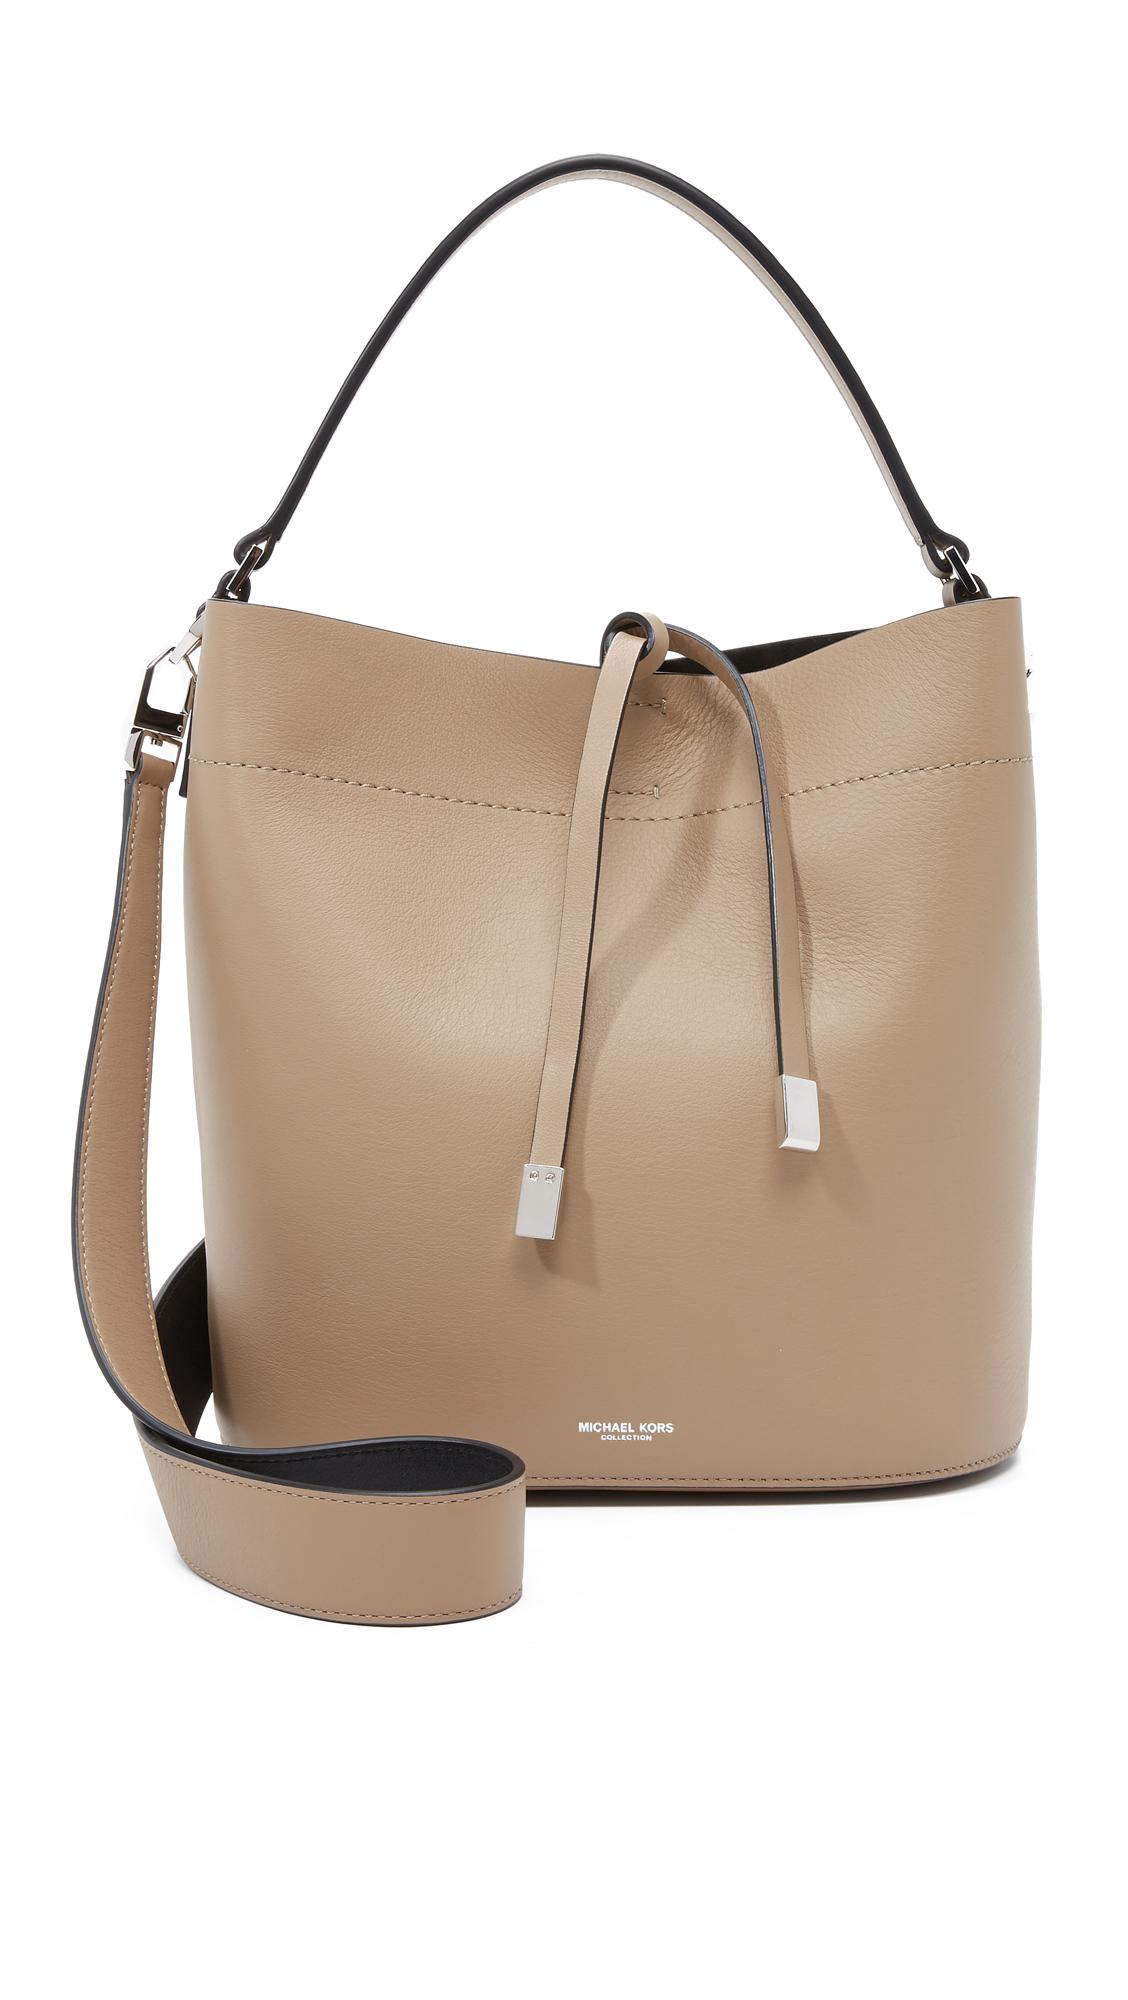 michael kors miranda medium shoulder bag in brown lyst. Black Bedroom Furniture Sets. Home Design Ideas